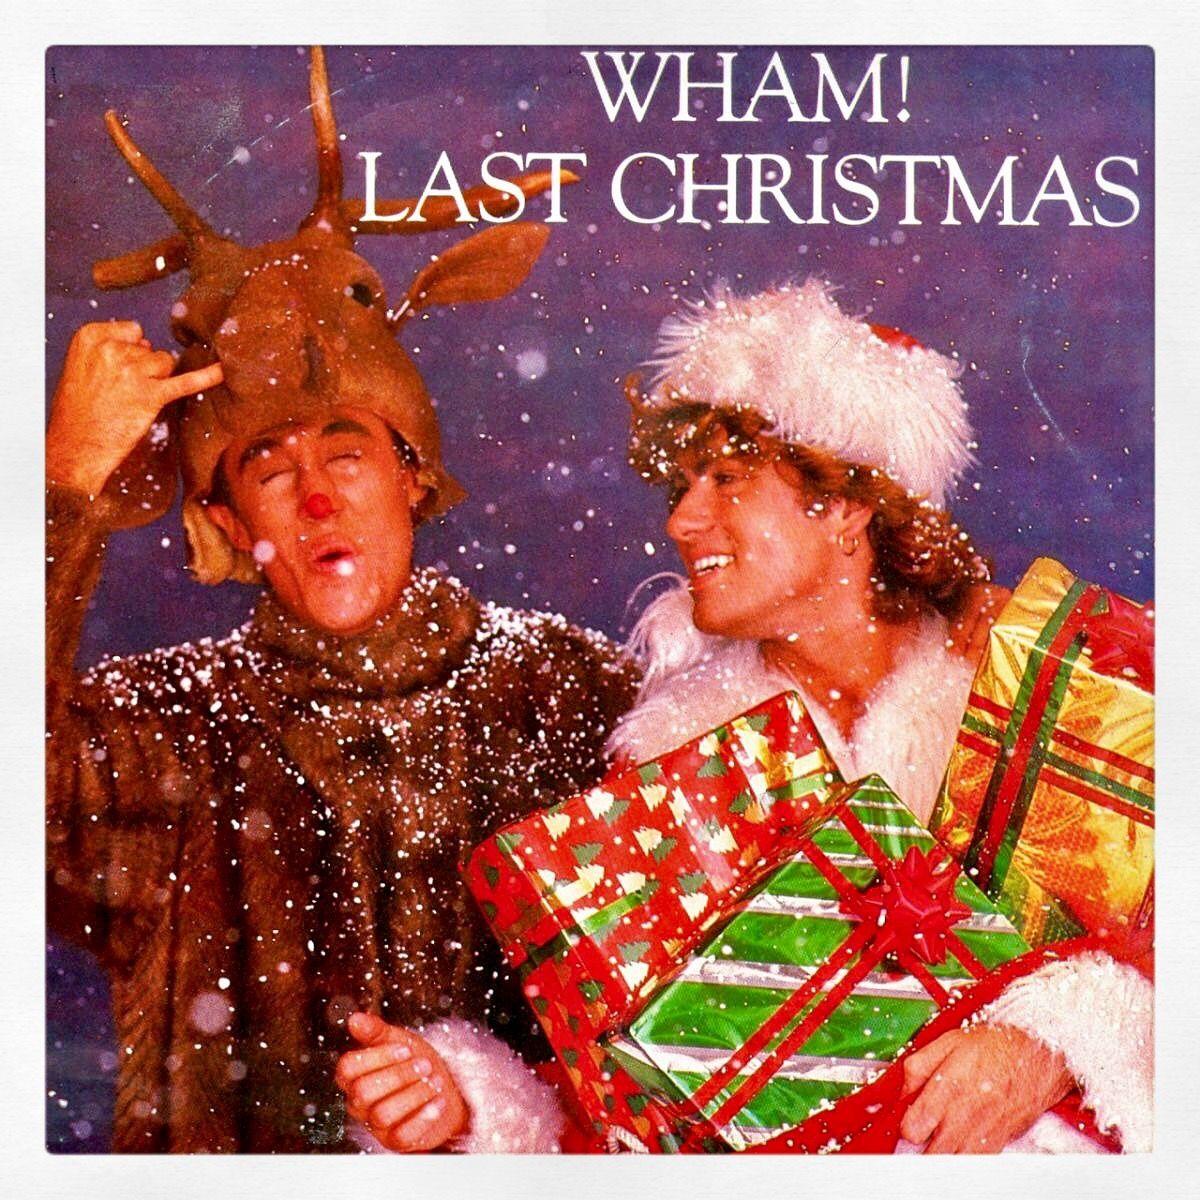 One Of My Favorite Christmas Songs Fbf 1984 Lastchristmas Wham Love It Georgemichael Classic England Eng Dzhordzh Majkl Rozhdestvenskie Kartiny Kartiny